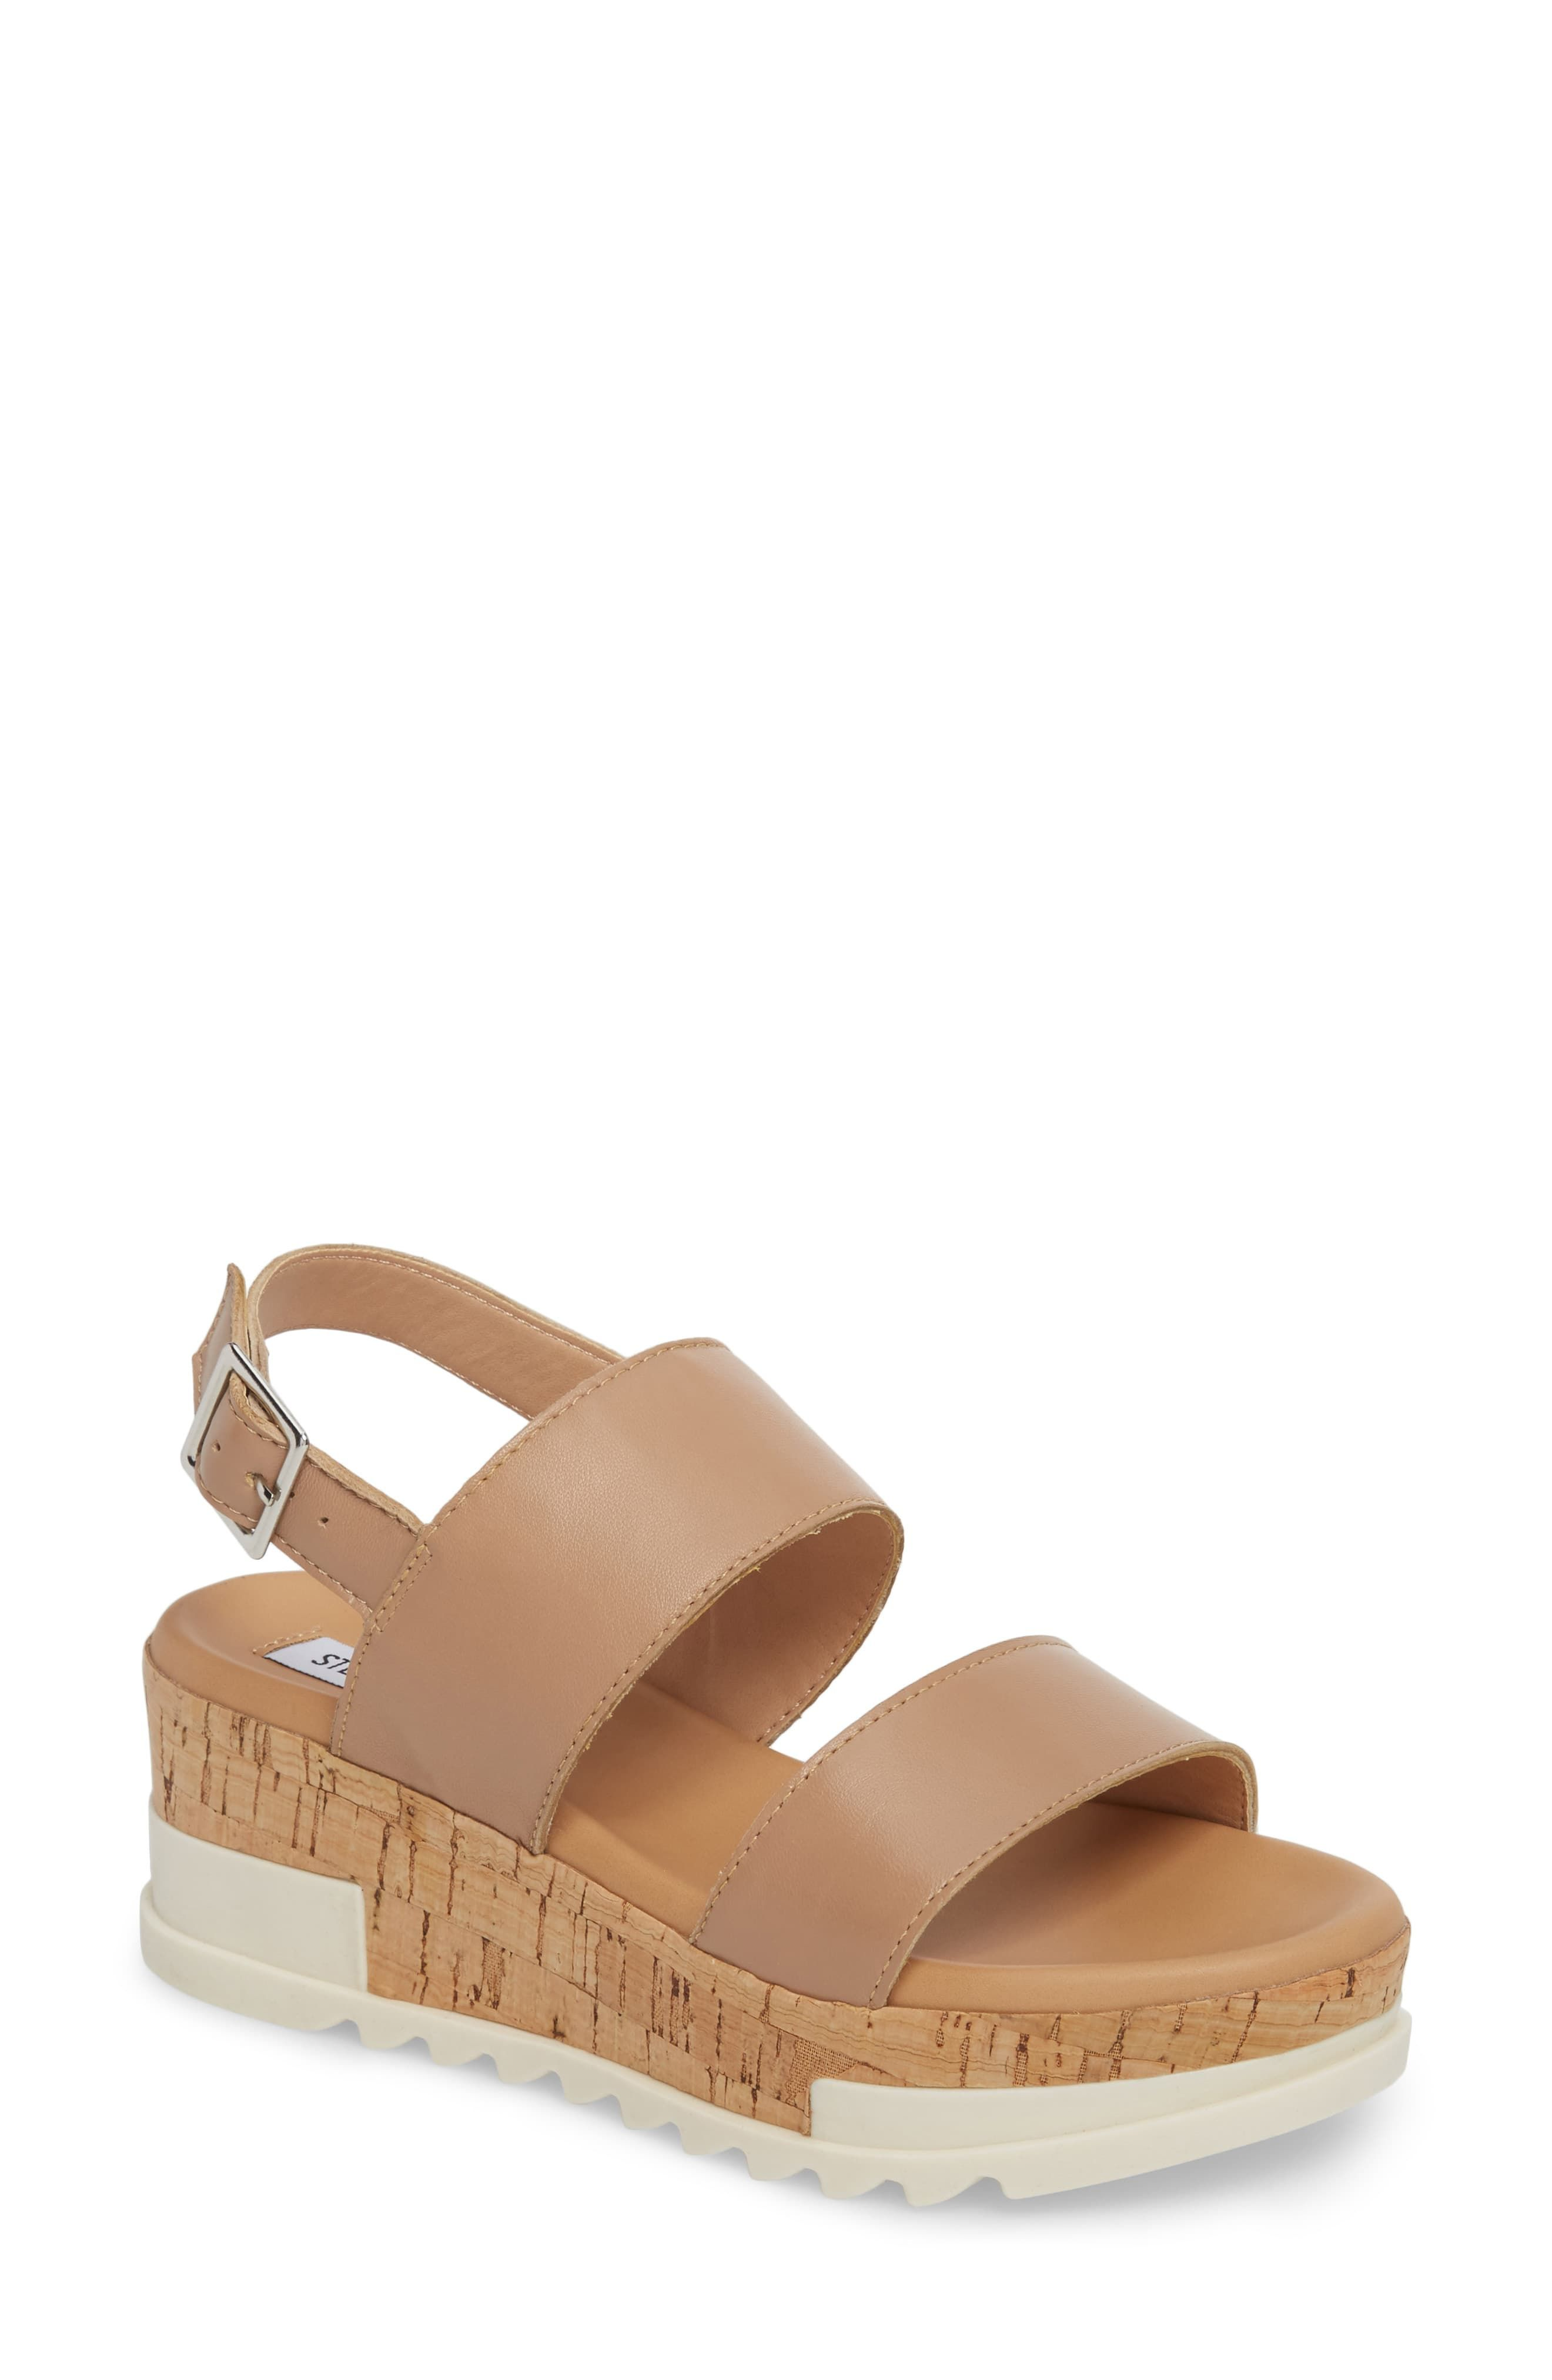 25b0cd86930 Steve Madden Brenda Wedge Sandal in 2019 | Products | Wedge sandals ...